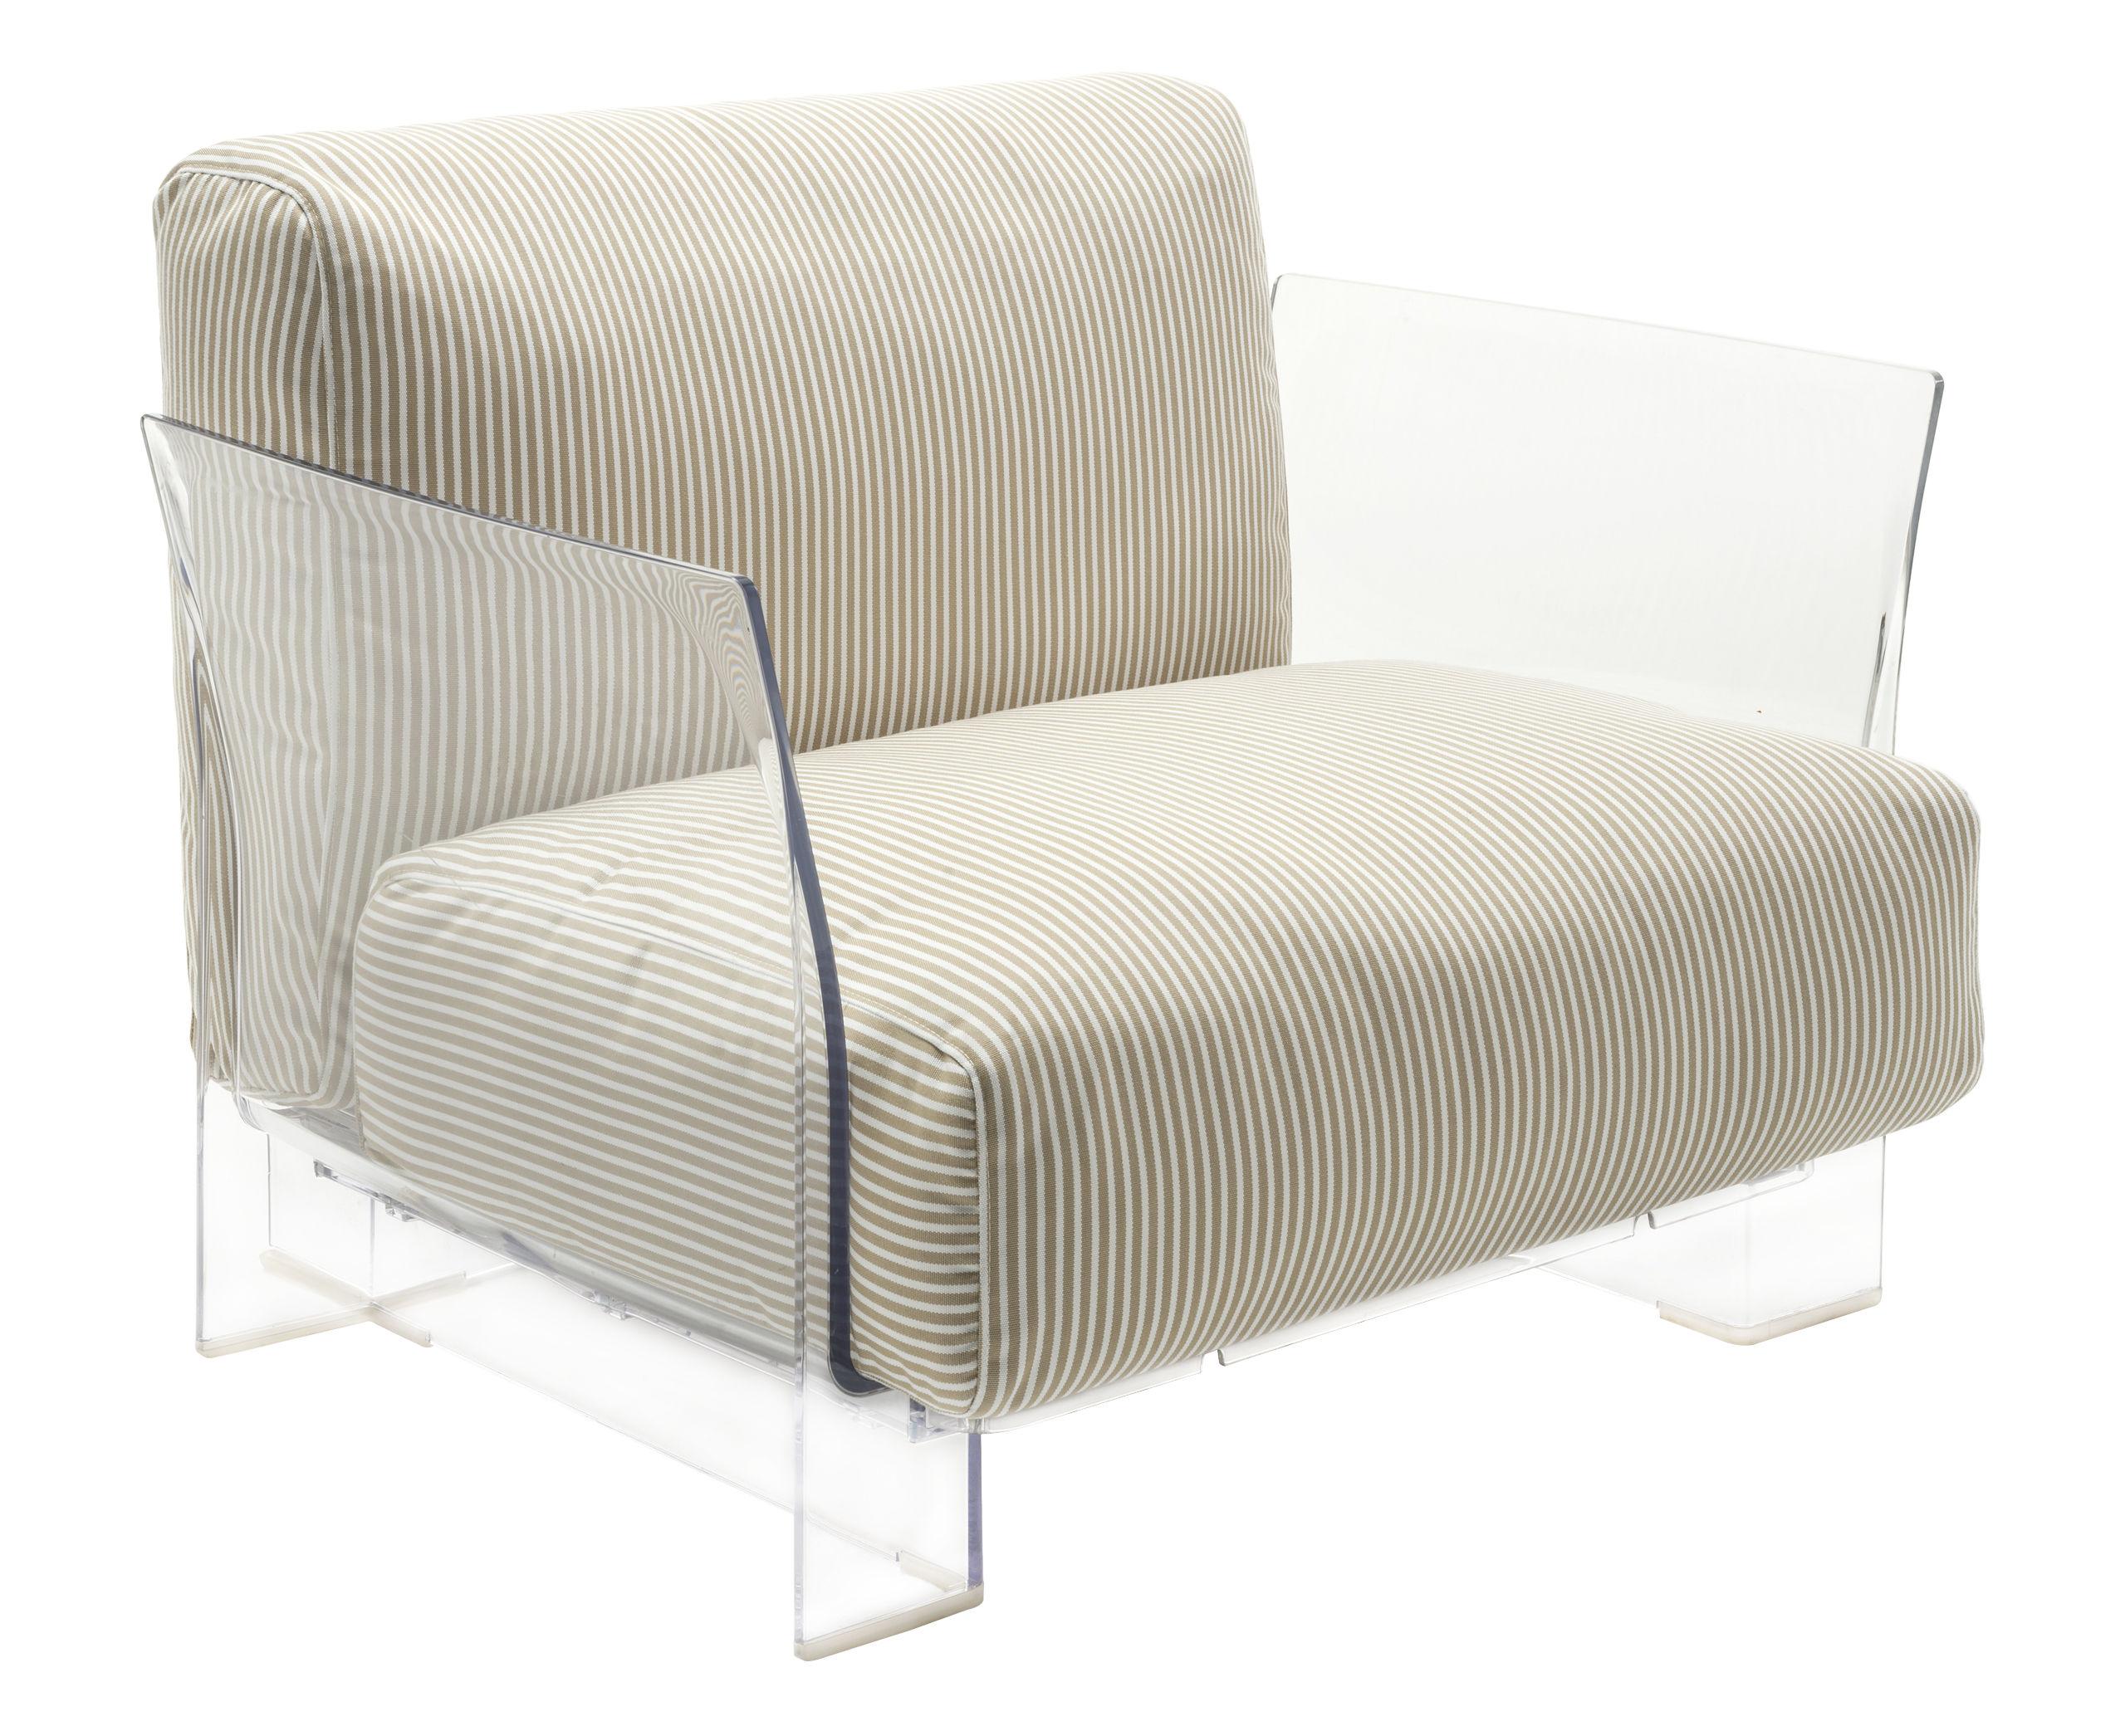 Poltrona imbottita pop outdoor di kartell beige made for Arredamento outdoor design